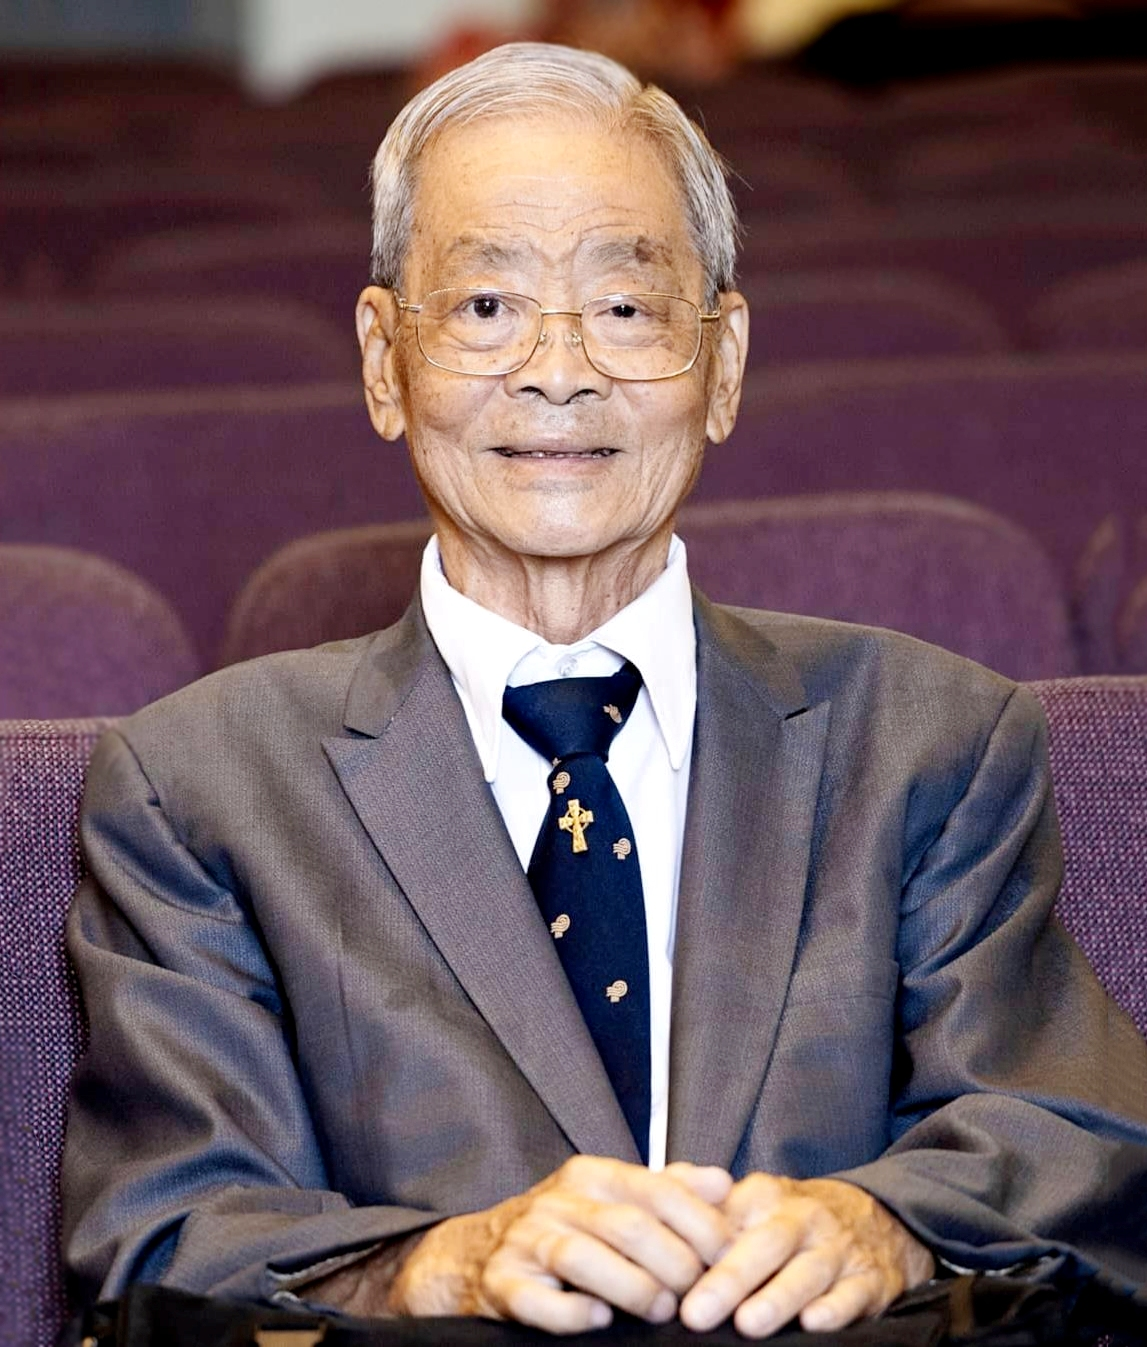 Rev. Thach Ngoc Huynh